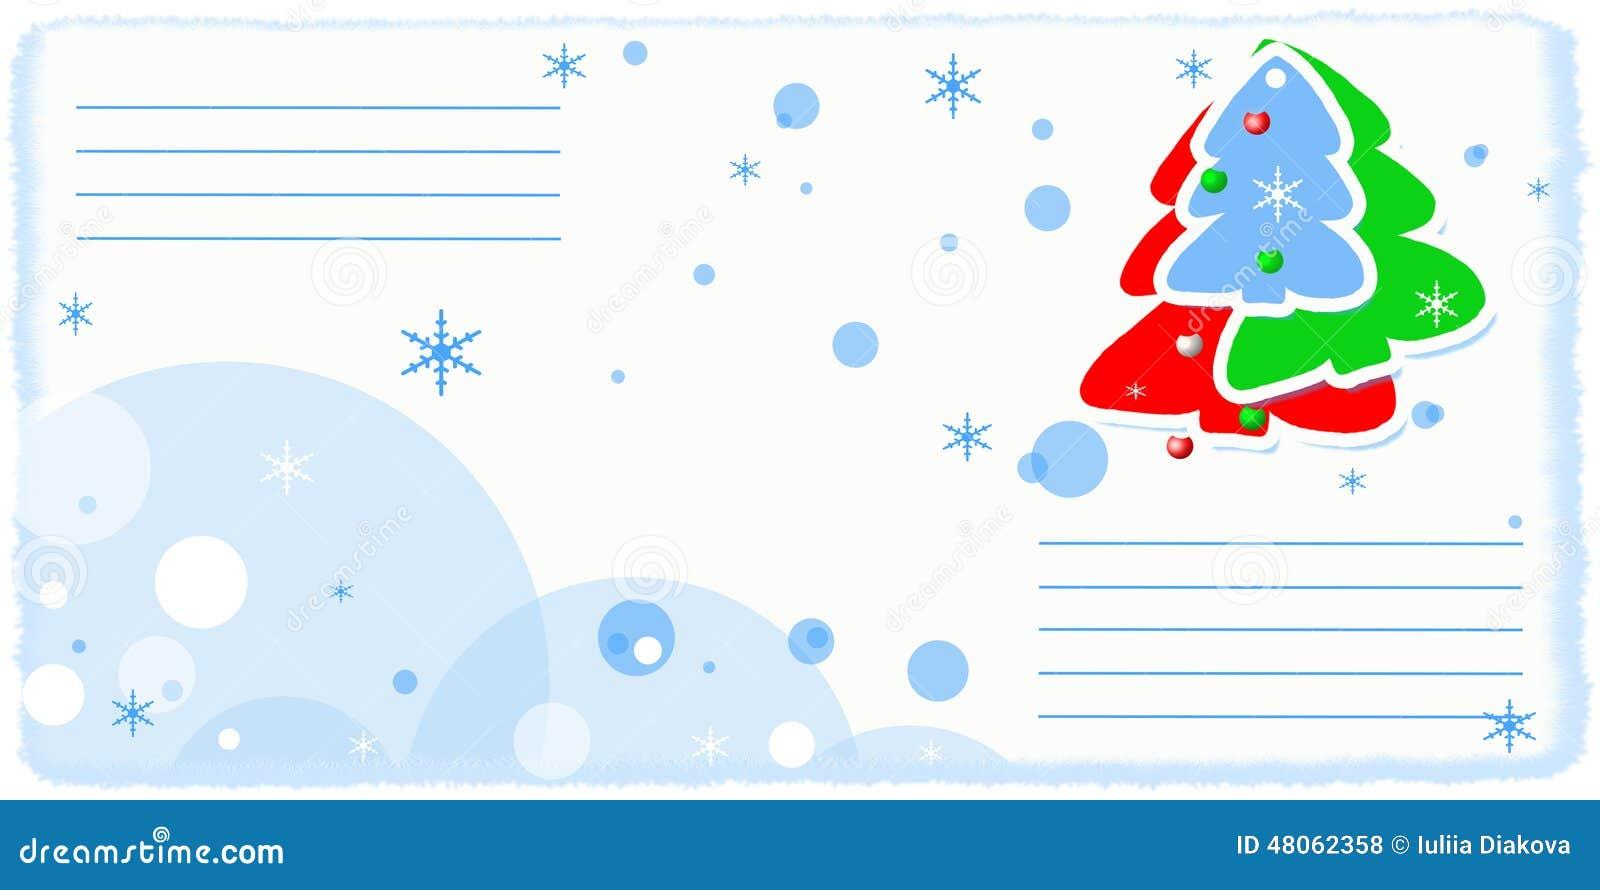 Air mail envelope stock illustration. Illustration of drawing - 48062358